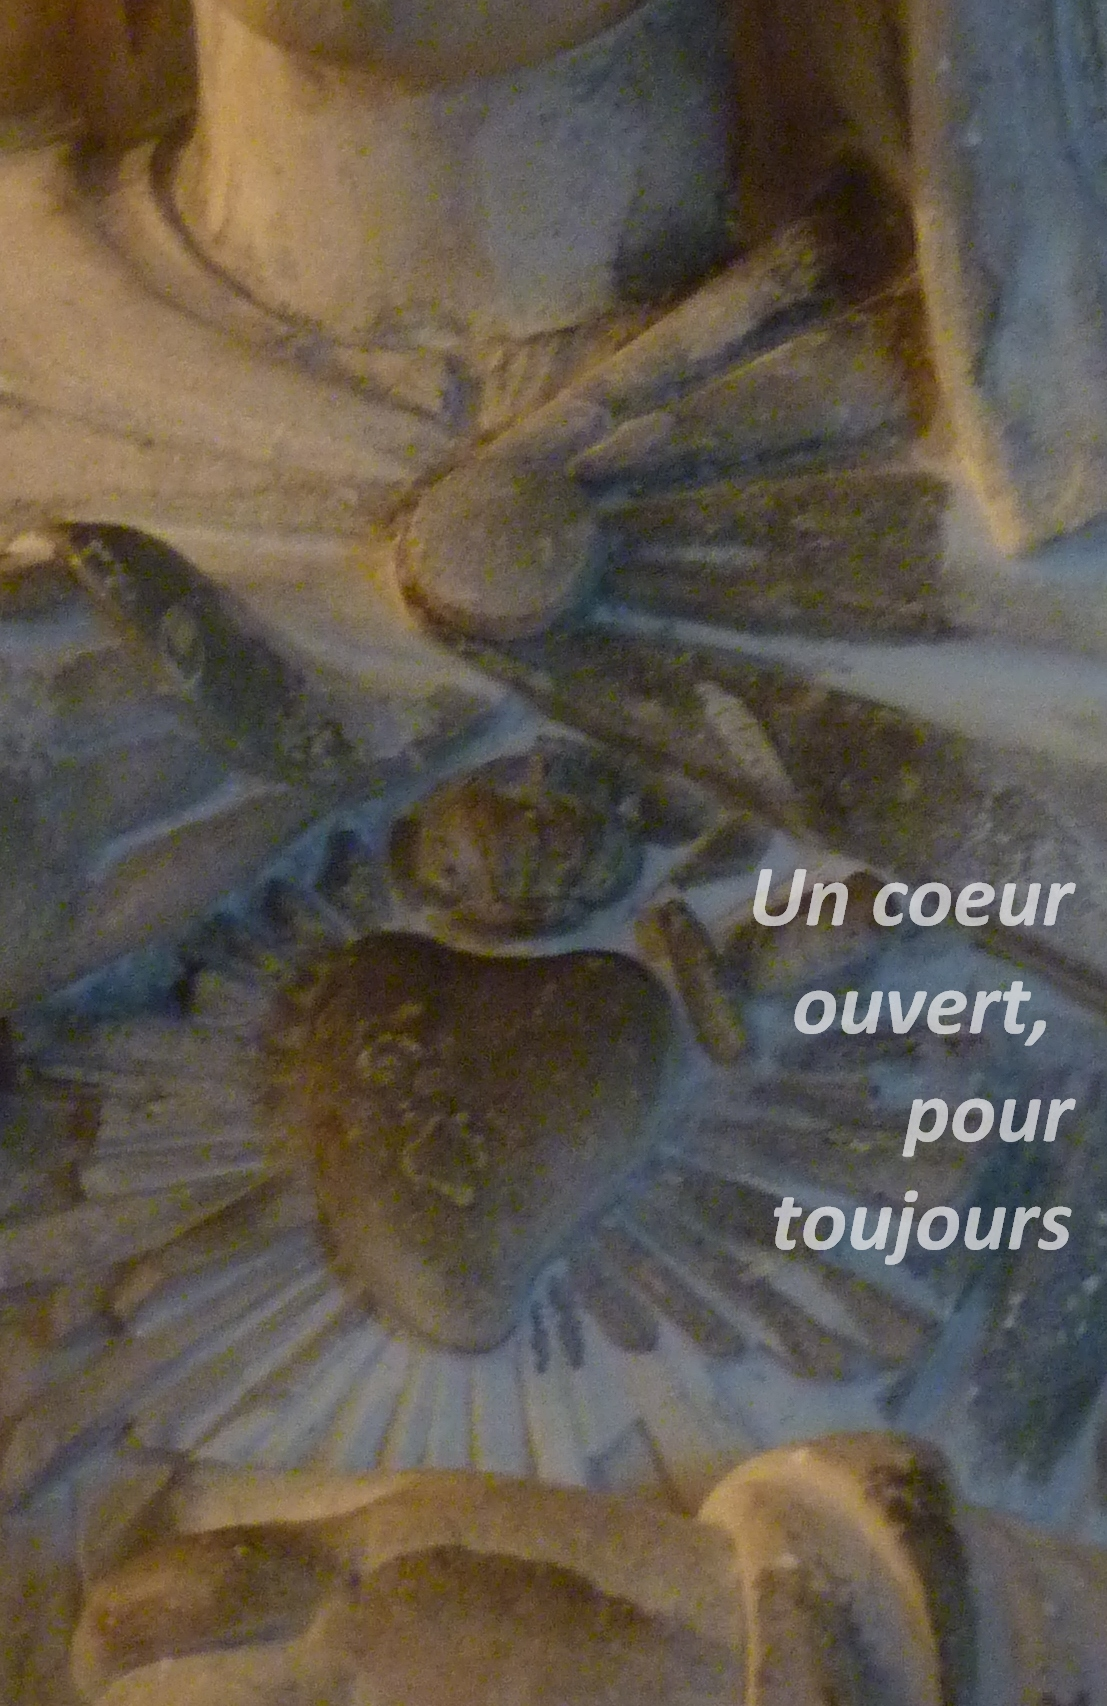 Coeur Immaculé Marie Foyerde Charité de Baye